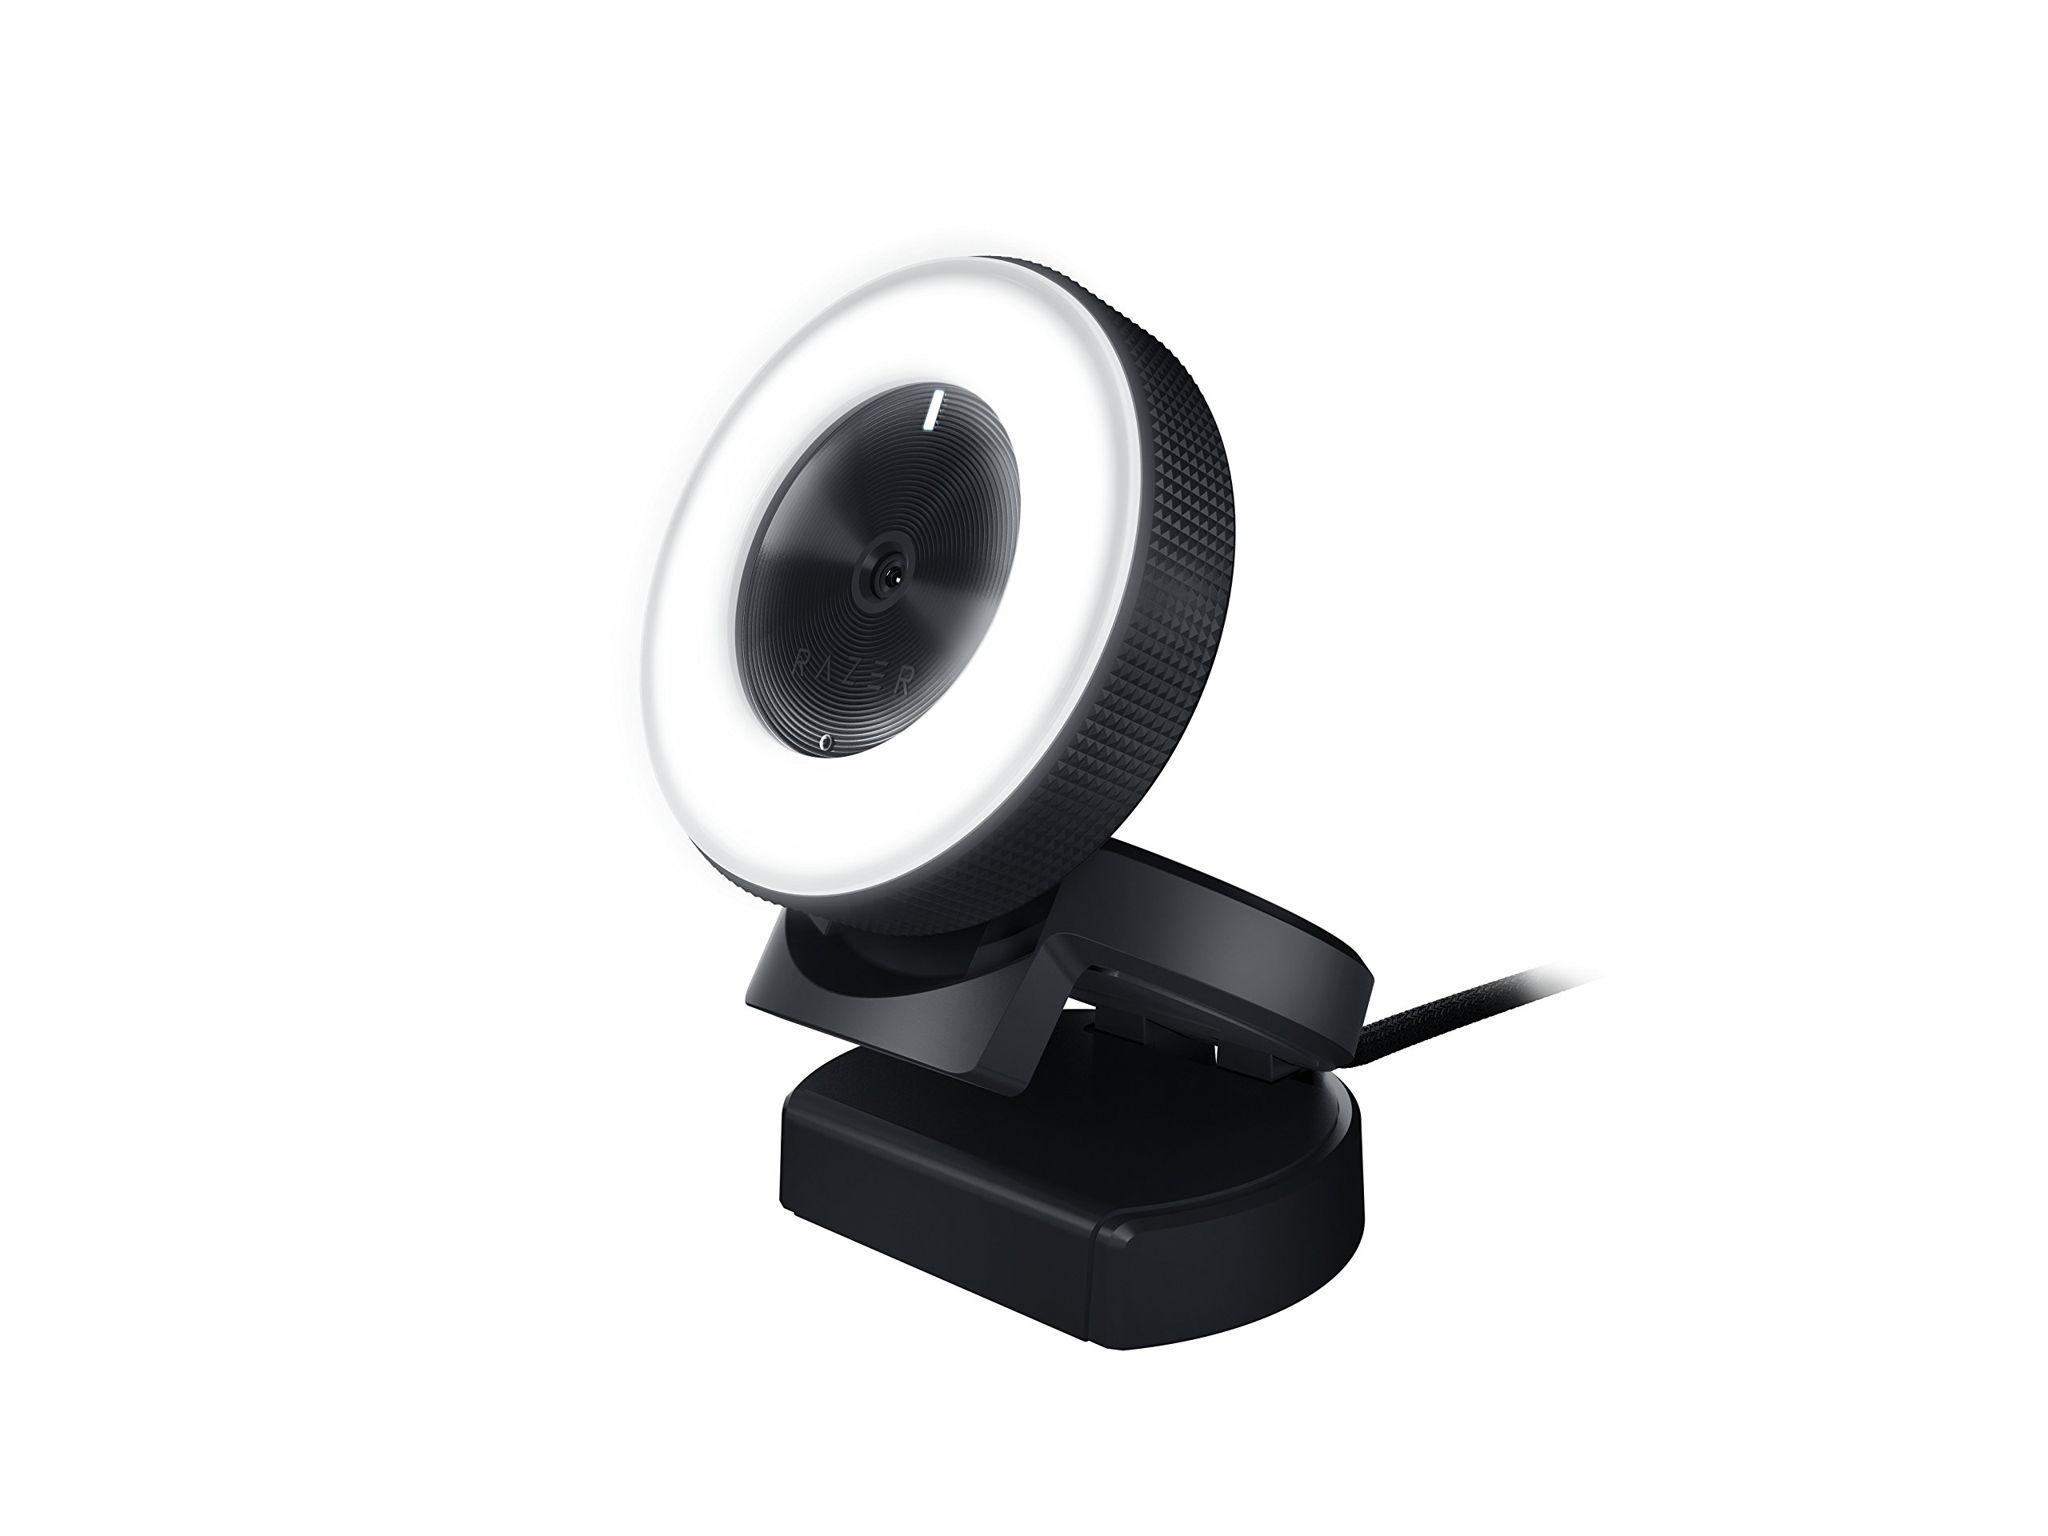 Logitech C920 Hd Pro Webcam Vs Razer Kiyo Slant